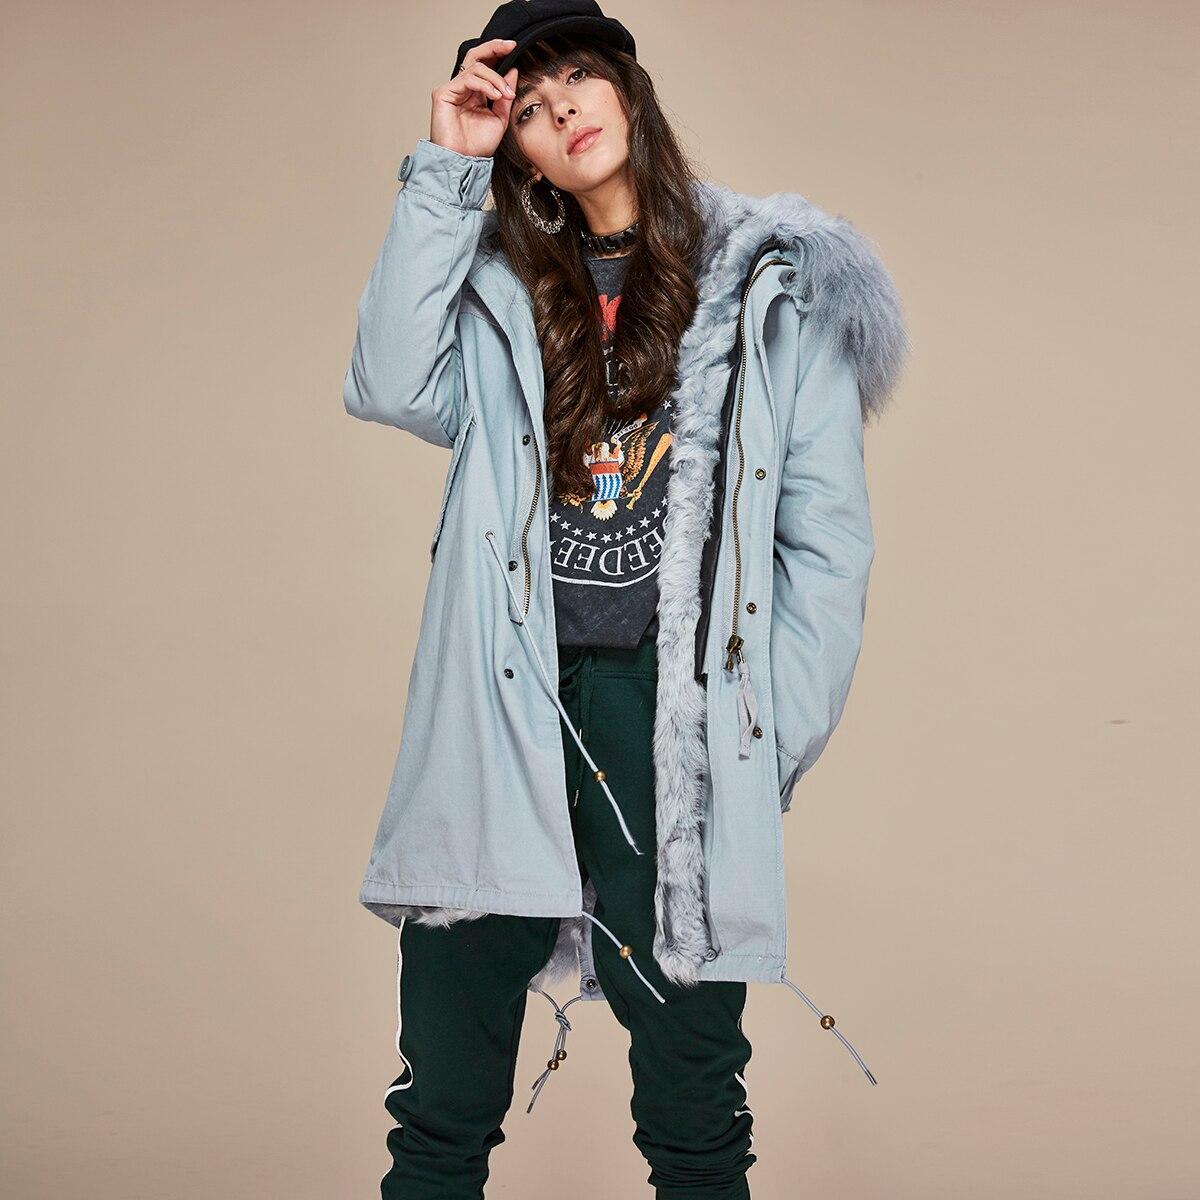 Aliexpress.com : Buy JAZZEVAR New Fashion Women's Real lamb fur ...